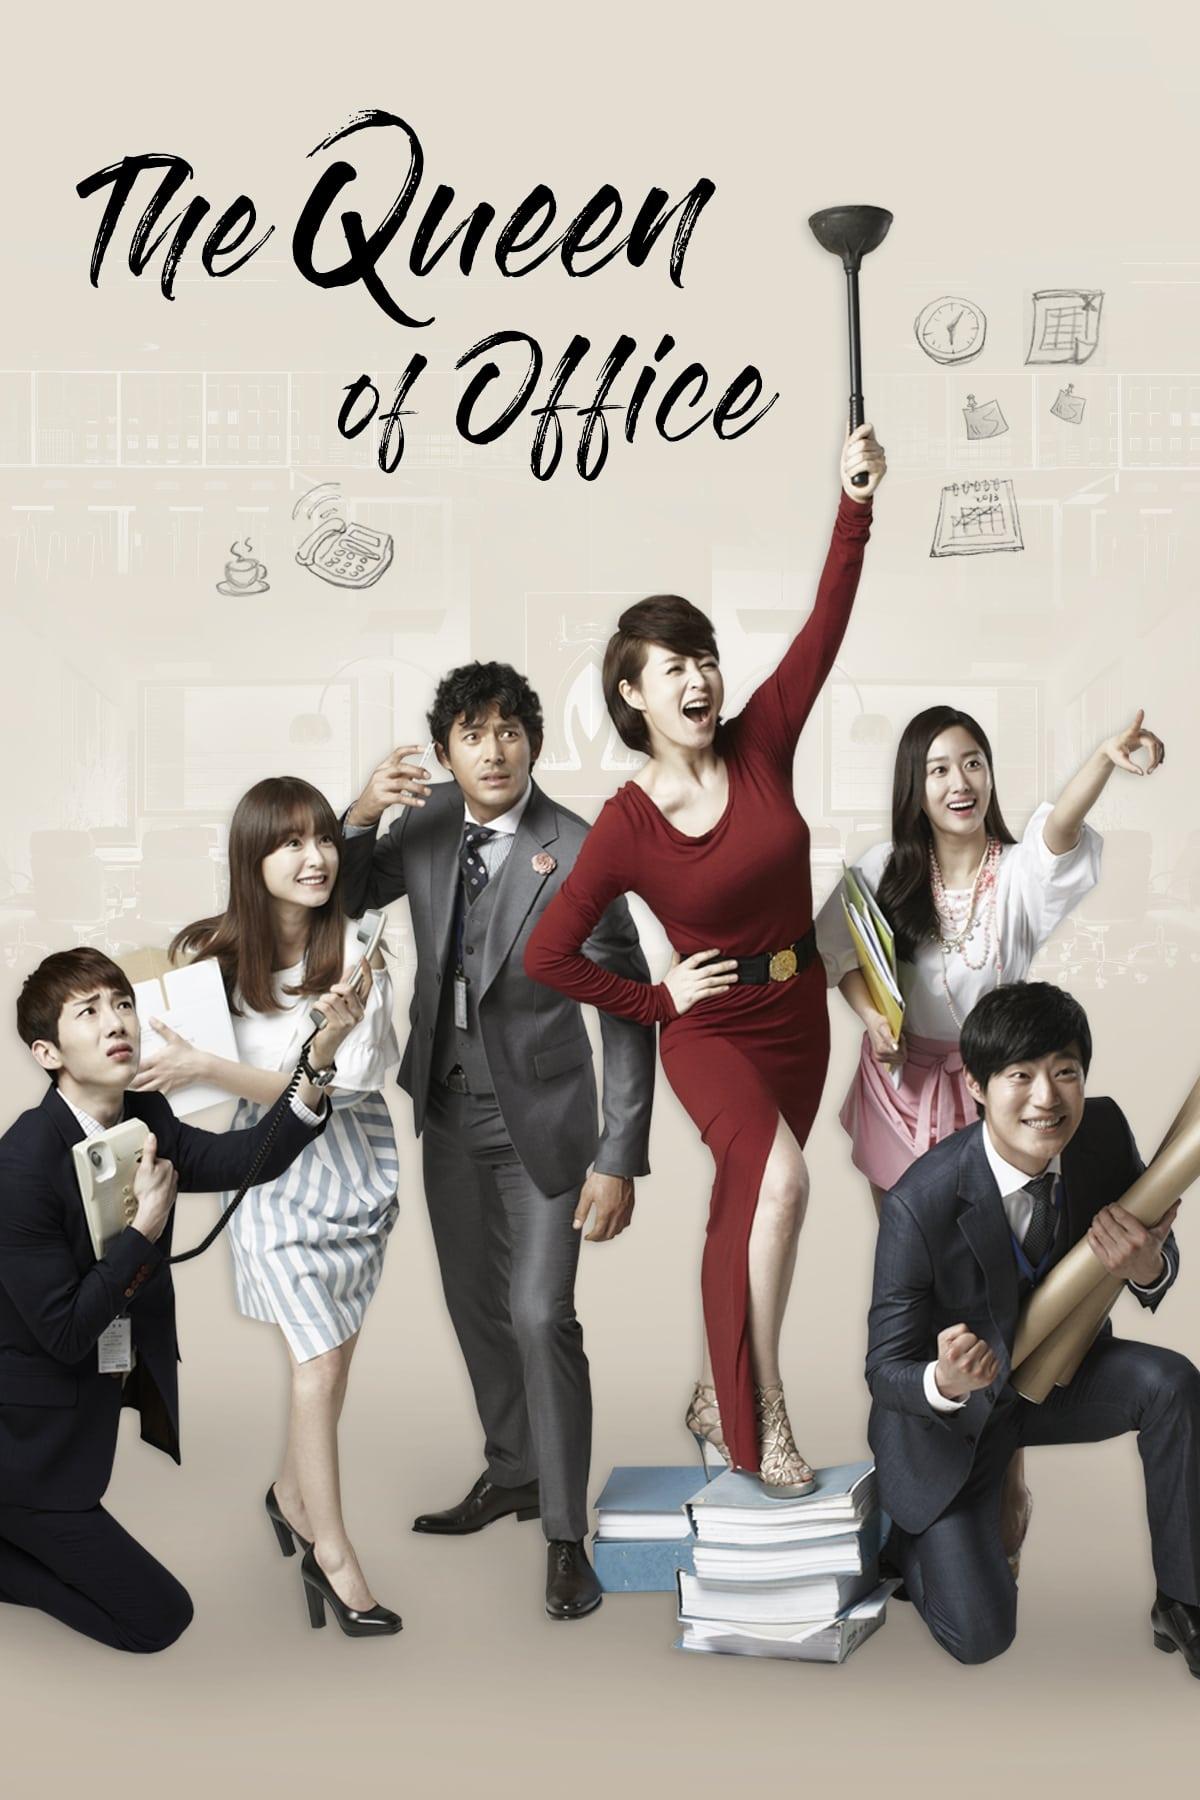 The Queen of Office